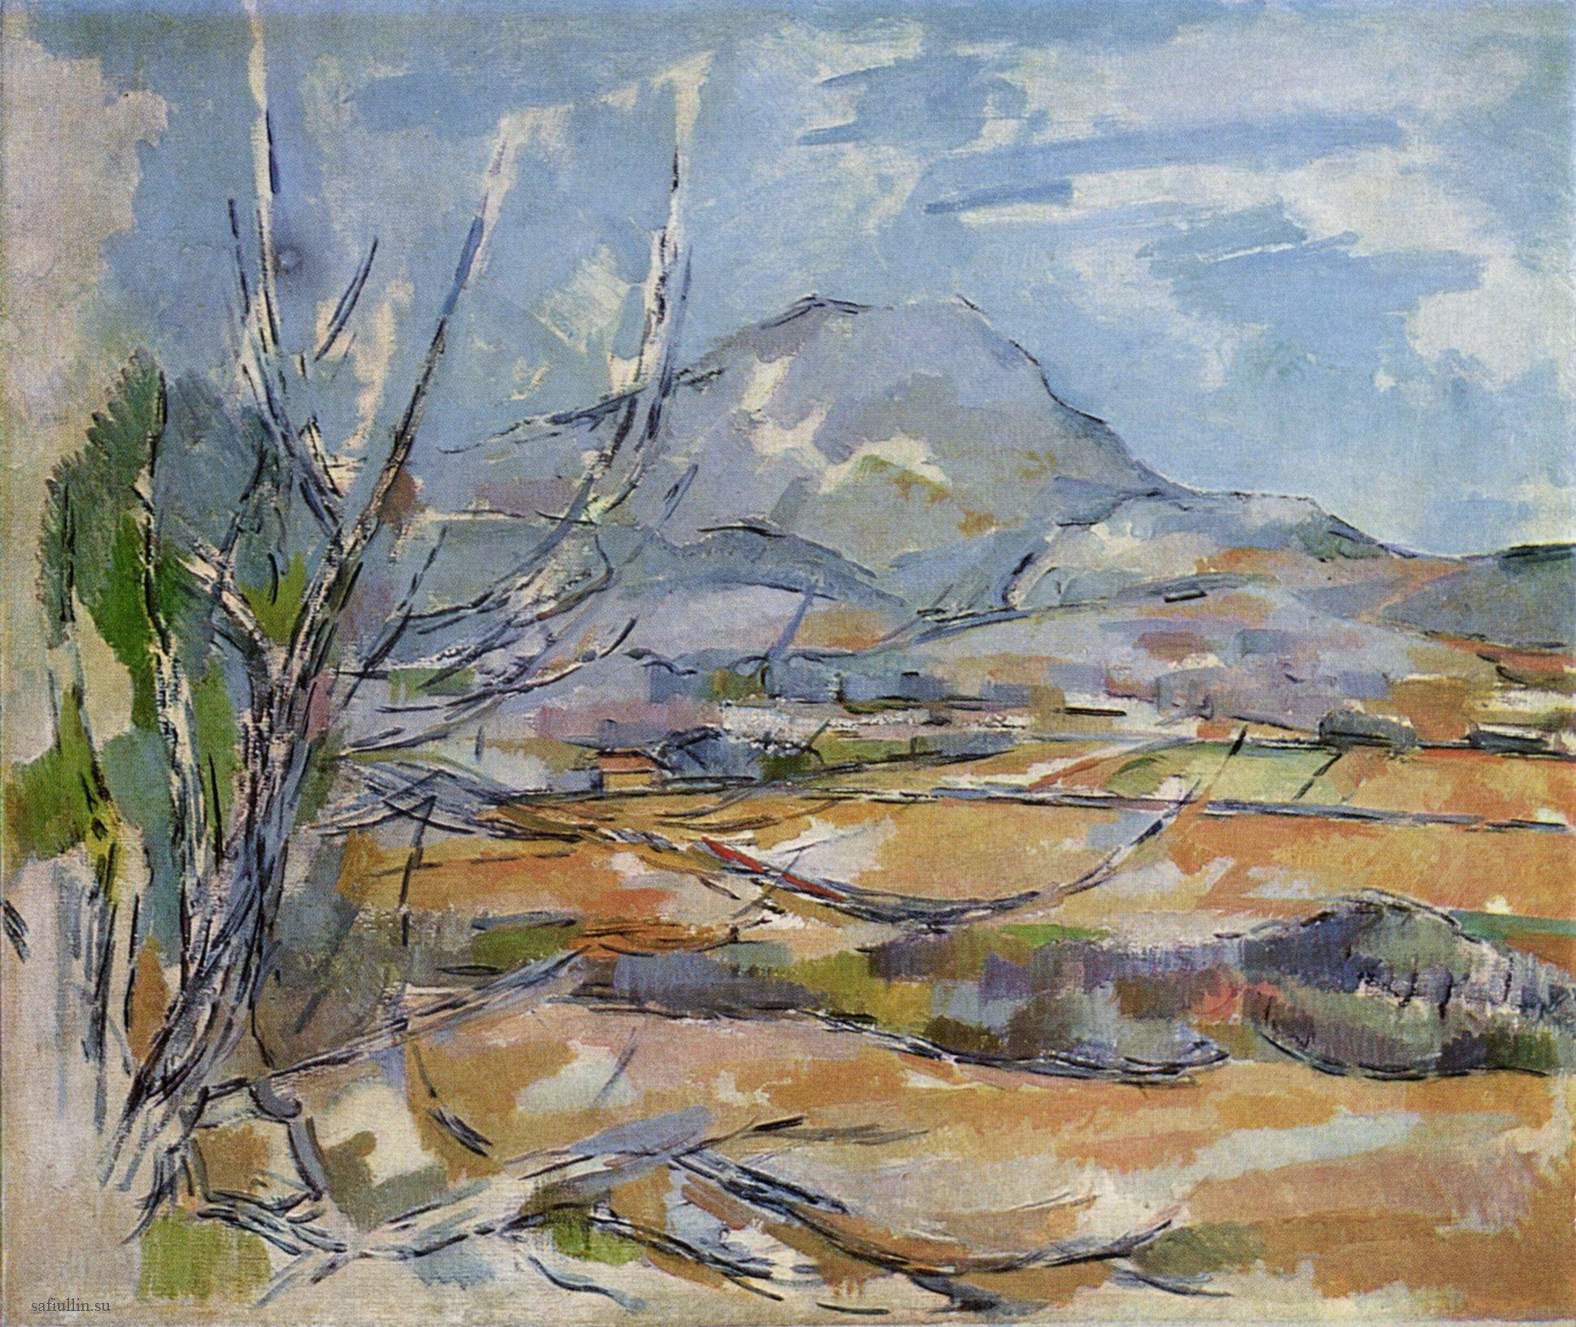 Сезанн картина гора Сент-Виктуар 1894 пейзажи природы Сафиуллин